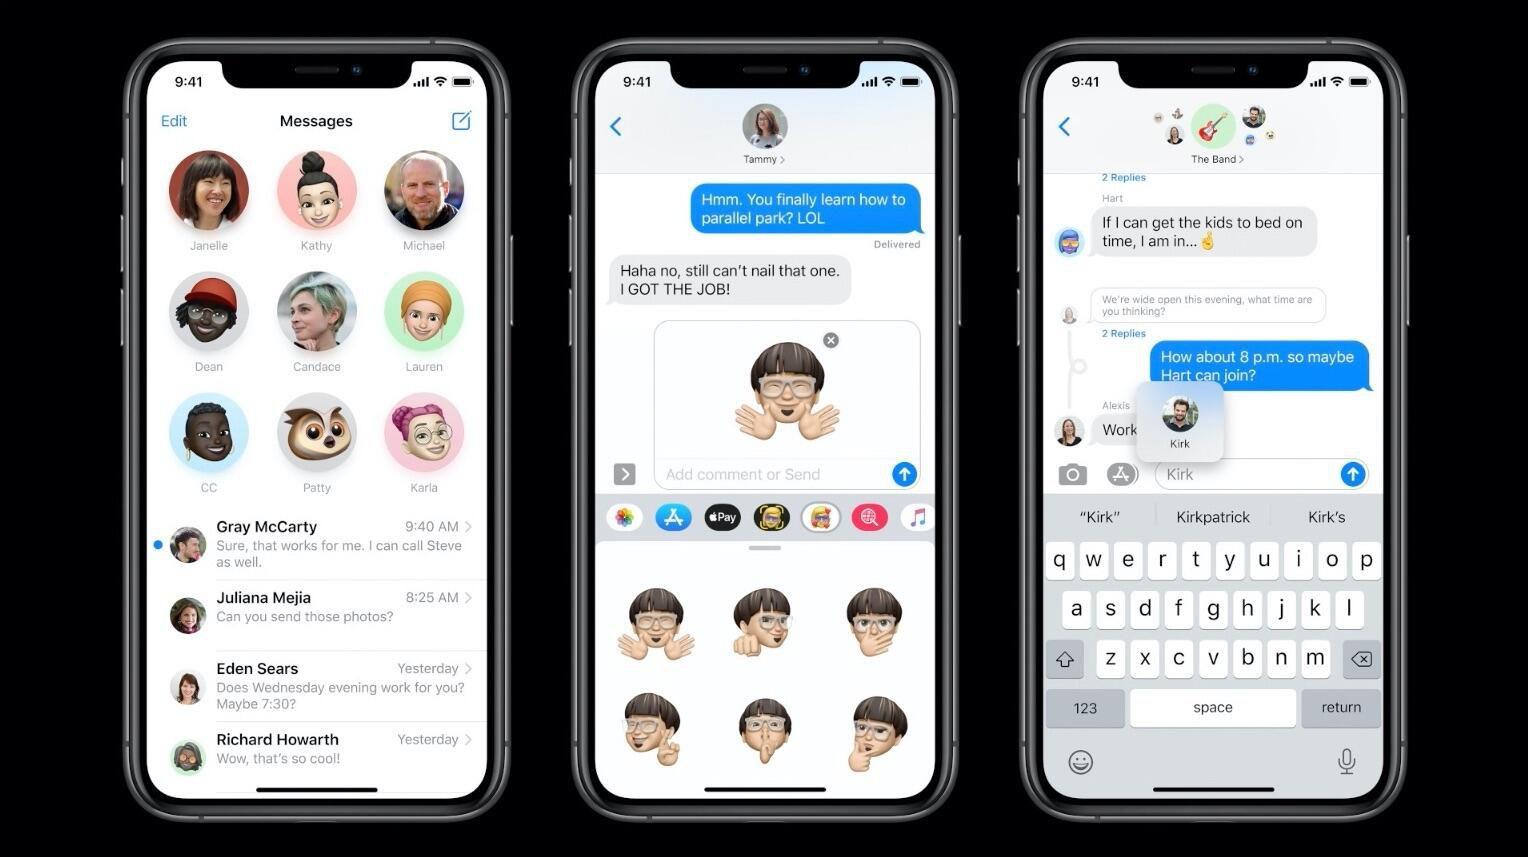 Apple-ios-14-pin-conversation-messages-screen-06222020